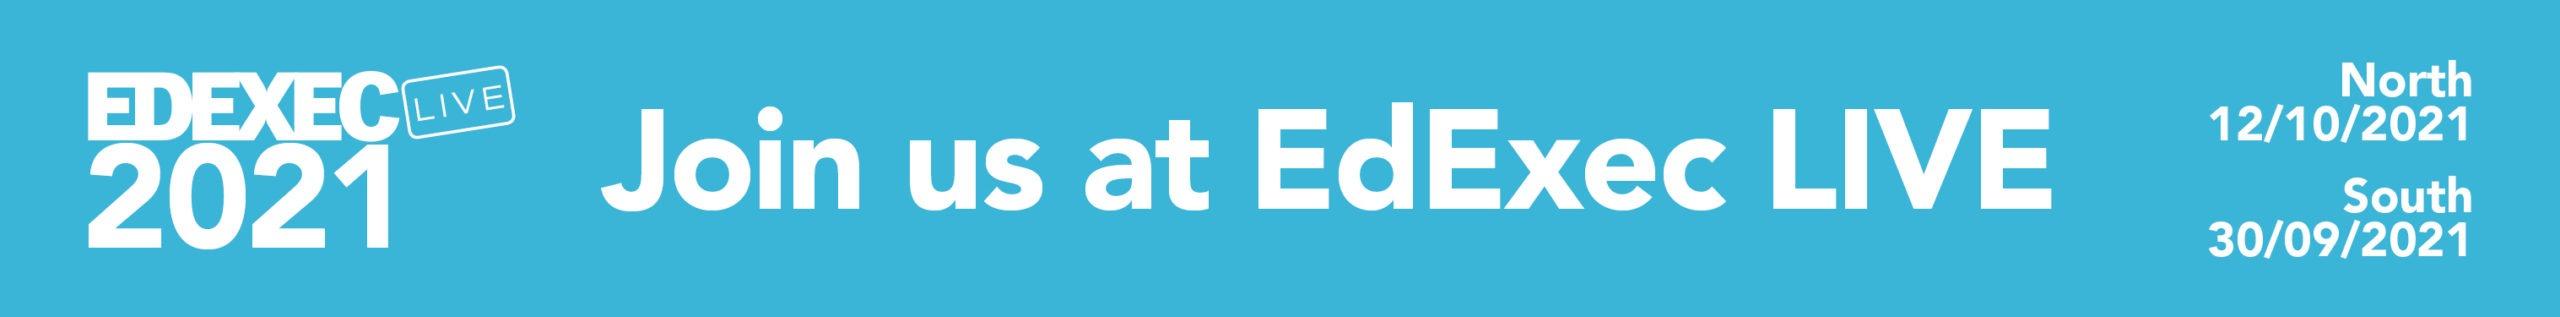 EEL2021_Leaderboard10.9.21